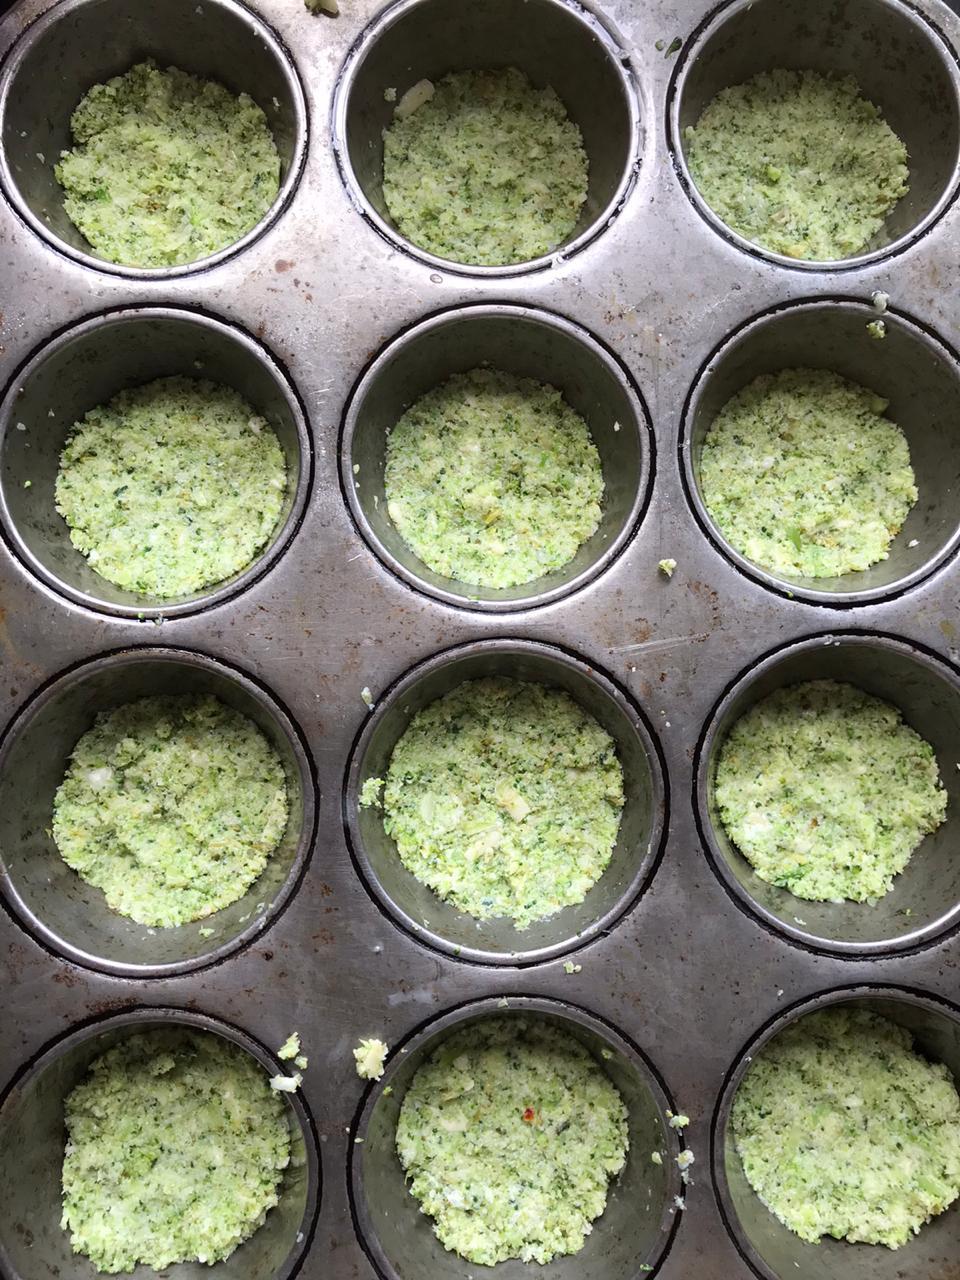 Placing mini cauliflower pizza dough into muffin tin